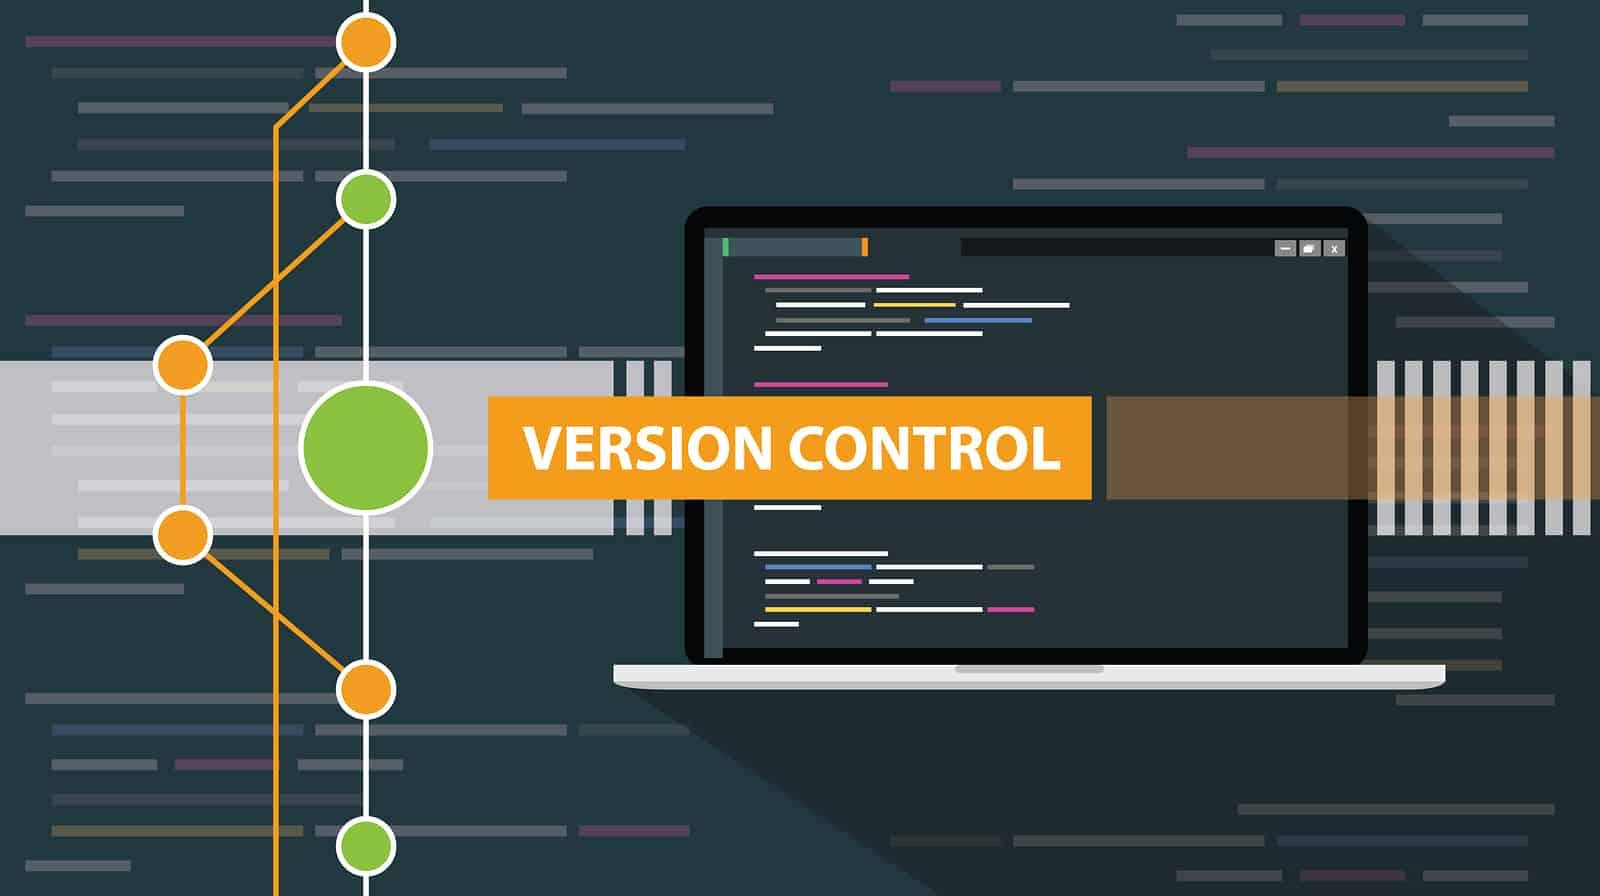 PowerPoint version control